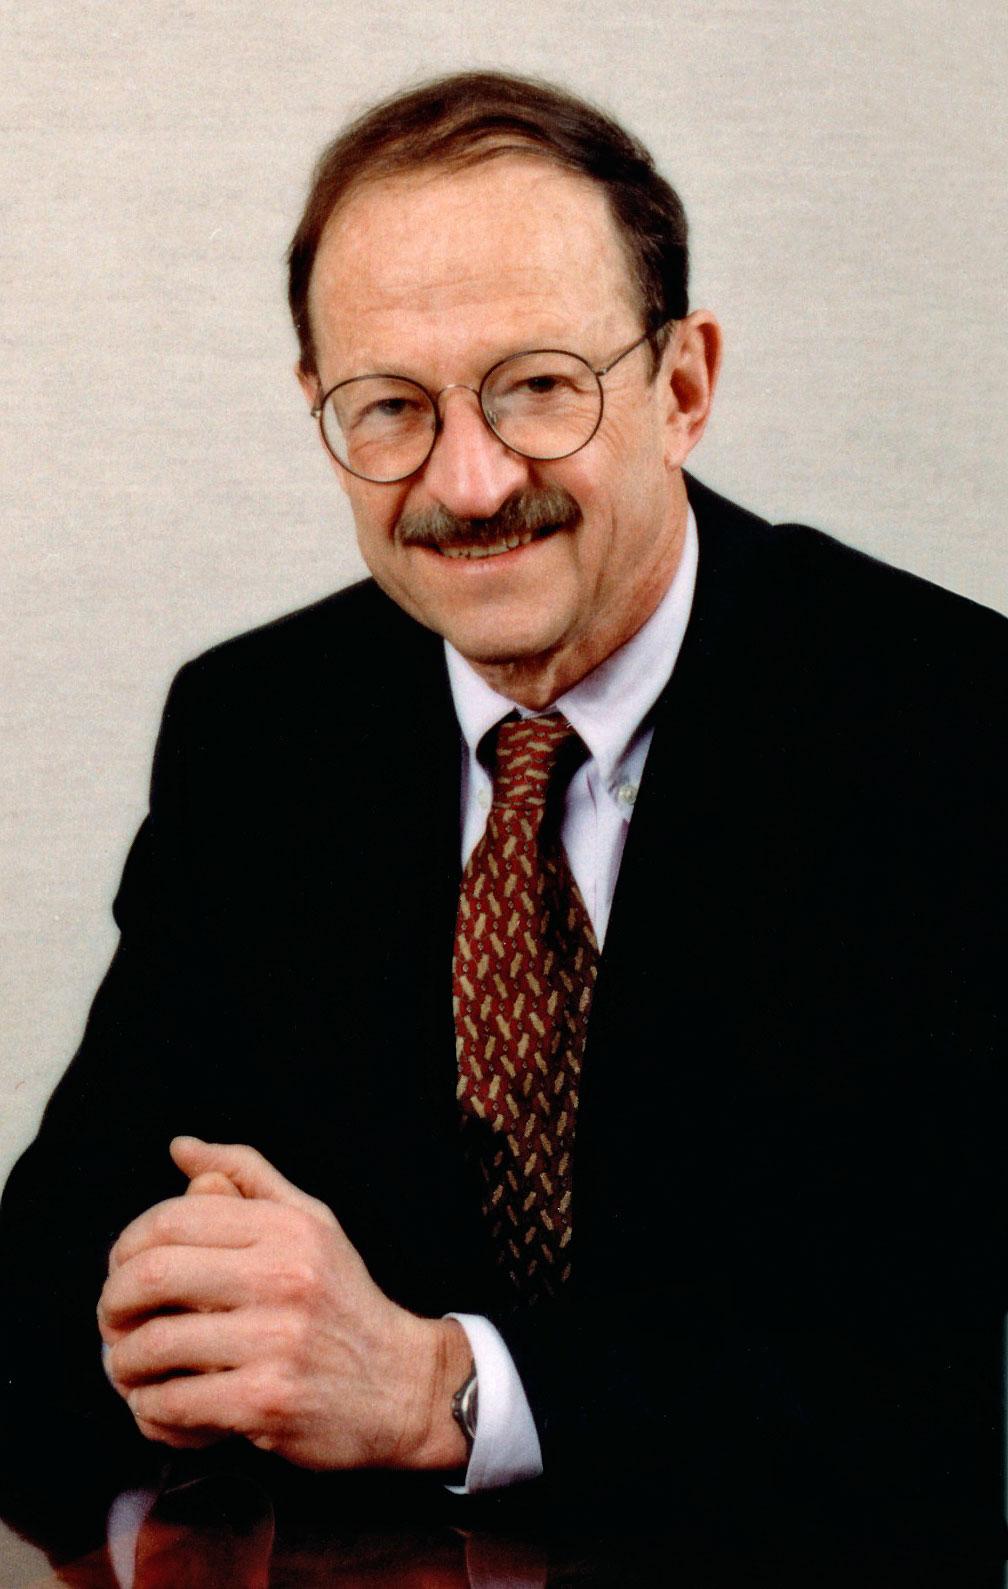 image of Harold E. Varmus